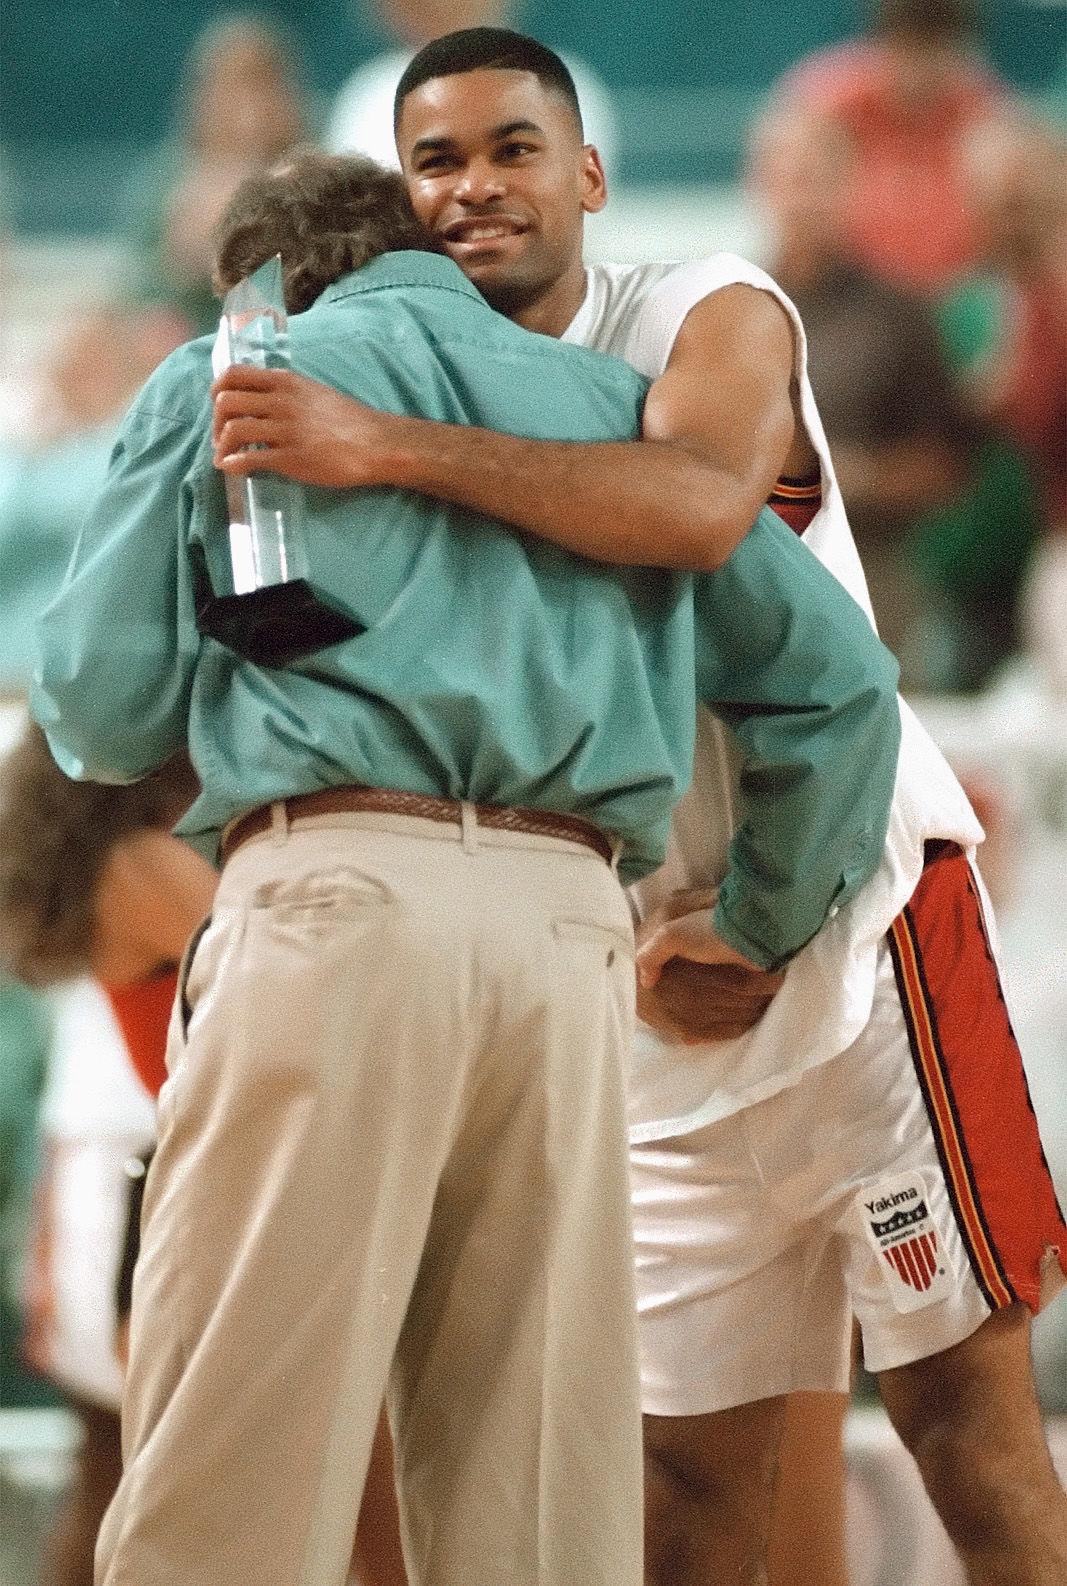 200517-yh-sports-yh-sports-recasner-hug.jpg